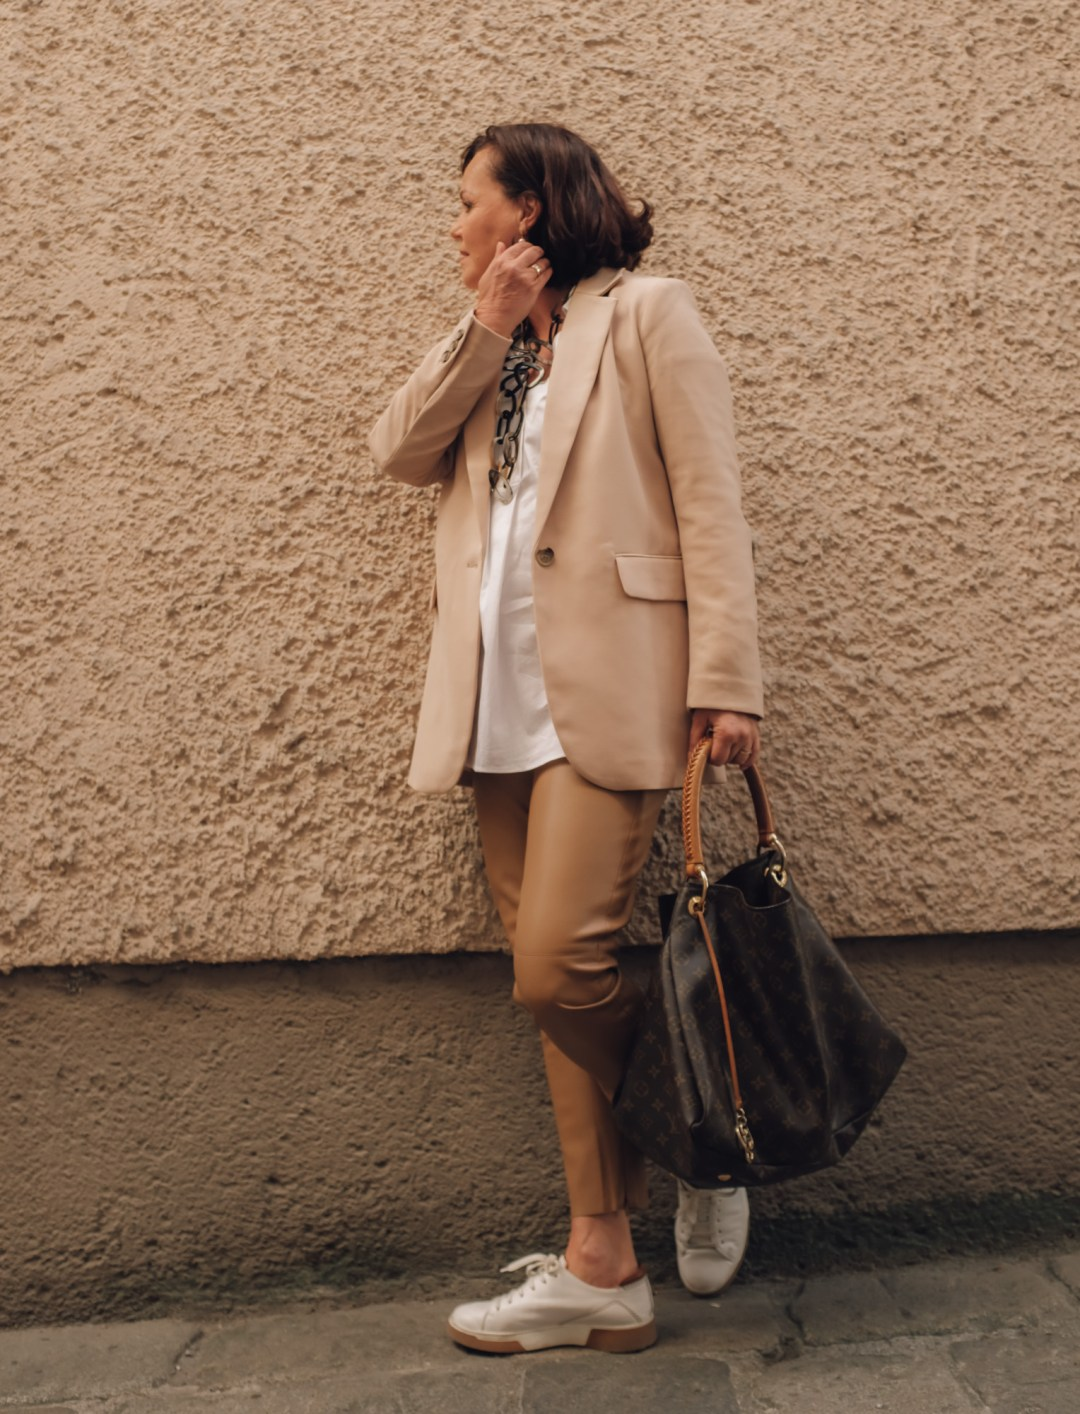 Inastil, Blazer, Lederhose, weiße Bluse, weiße Sneaker, Classystyle, Stilberatung, Modeberatung, Frühlingsmode, Ü50Mode, Styleover50, Hallein-4